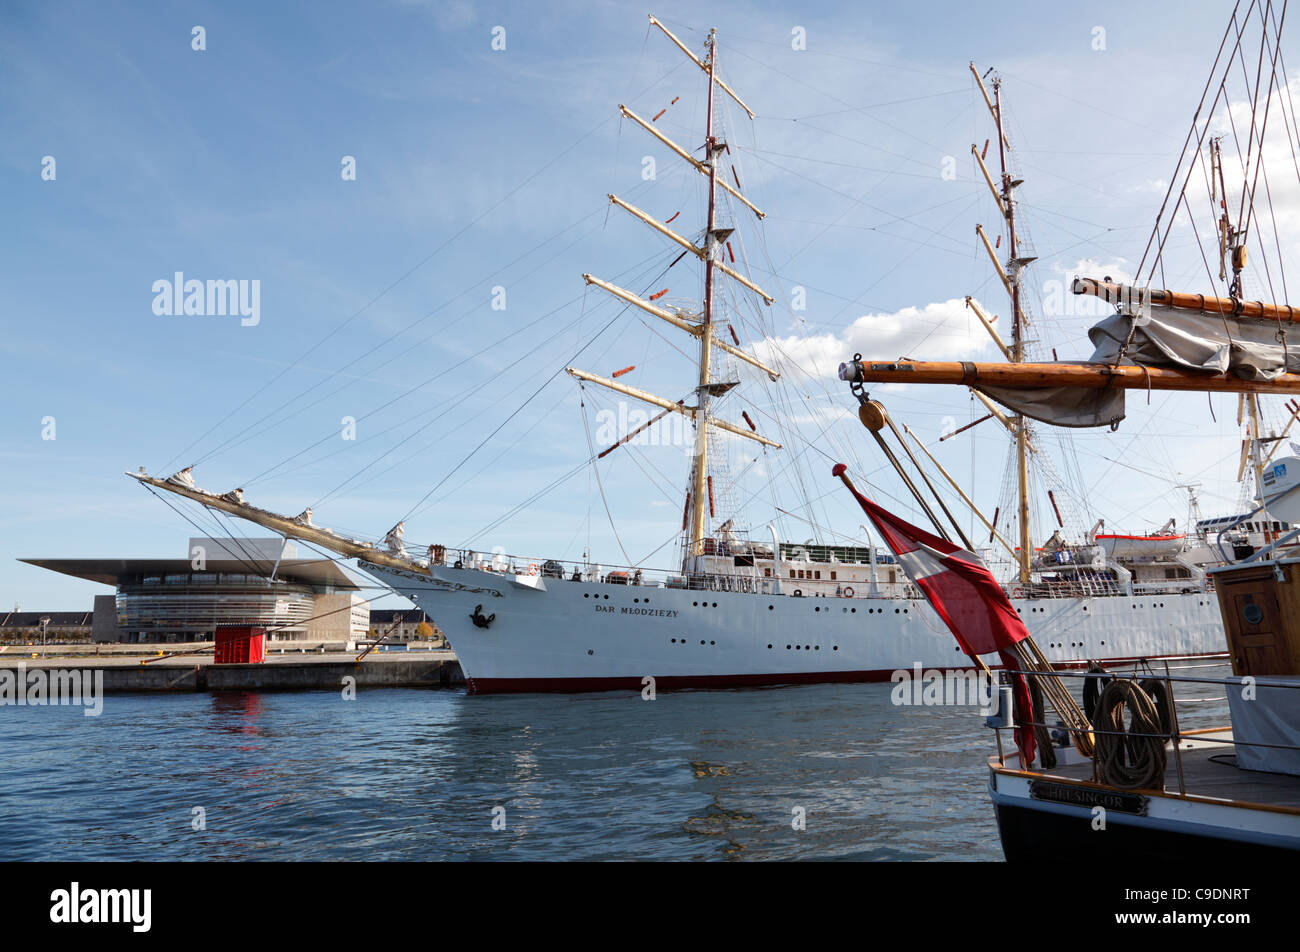 The large Polish tall ship Dar Mlodziezy moored near The Opera House on a visit to Copenhagen, Dannebrog on Danish - Stock Image